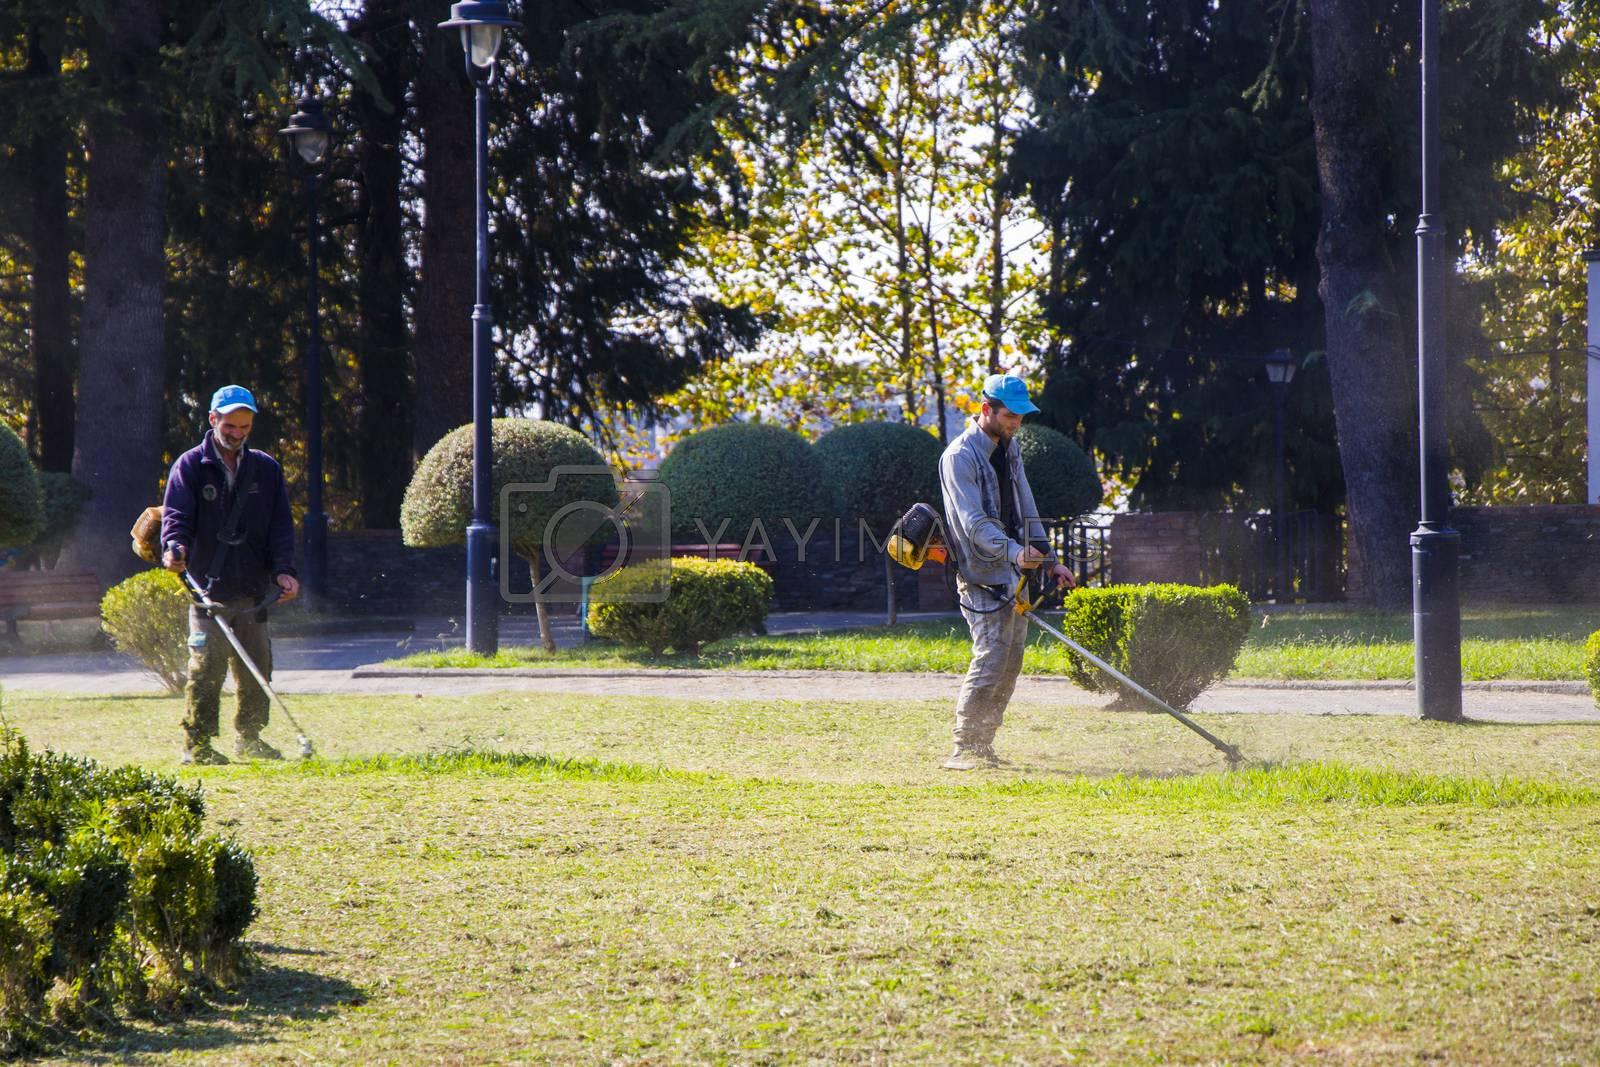 Zugdidi, Georgia - October 12, 2020: Grass cutting process, worker cutting grass with machine in the park